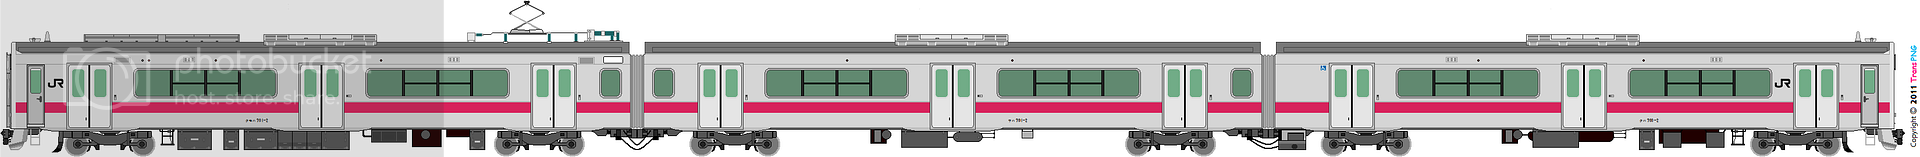 Train 2269